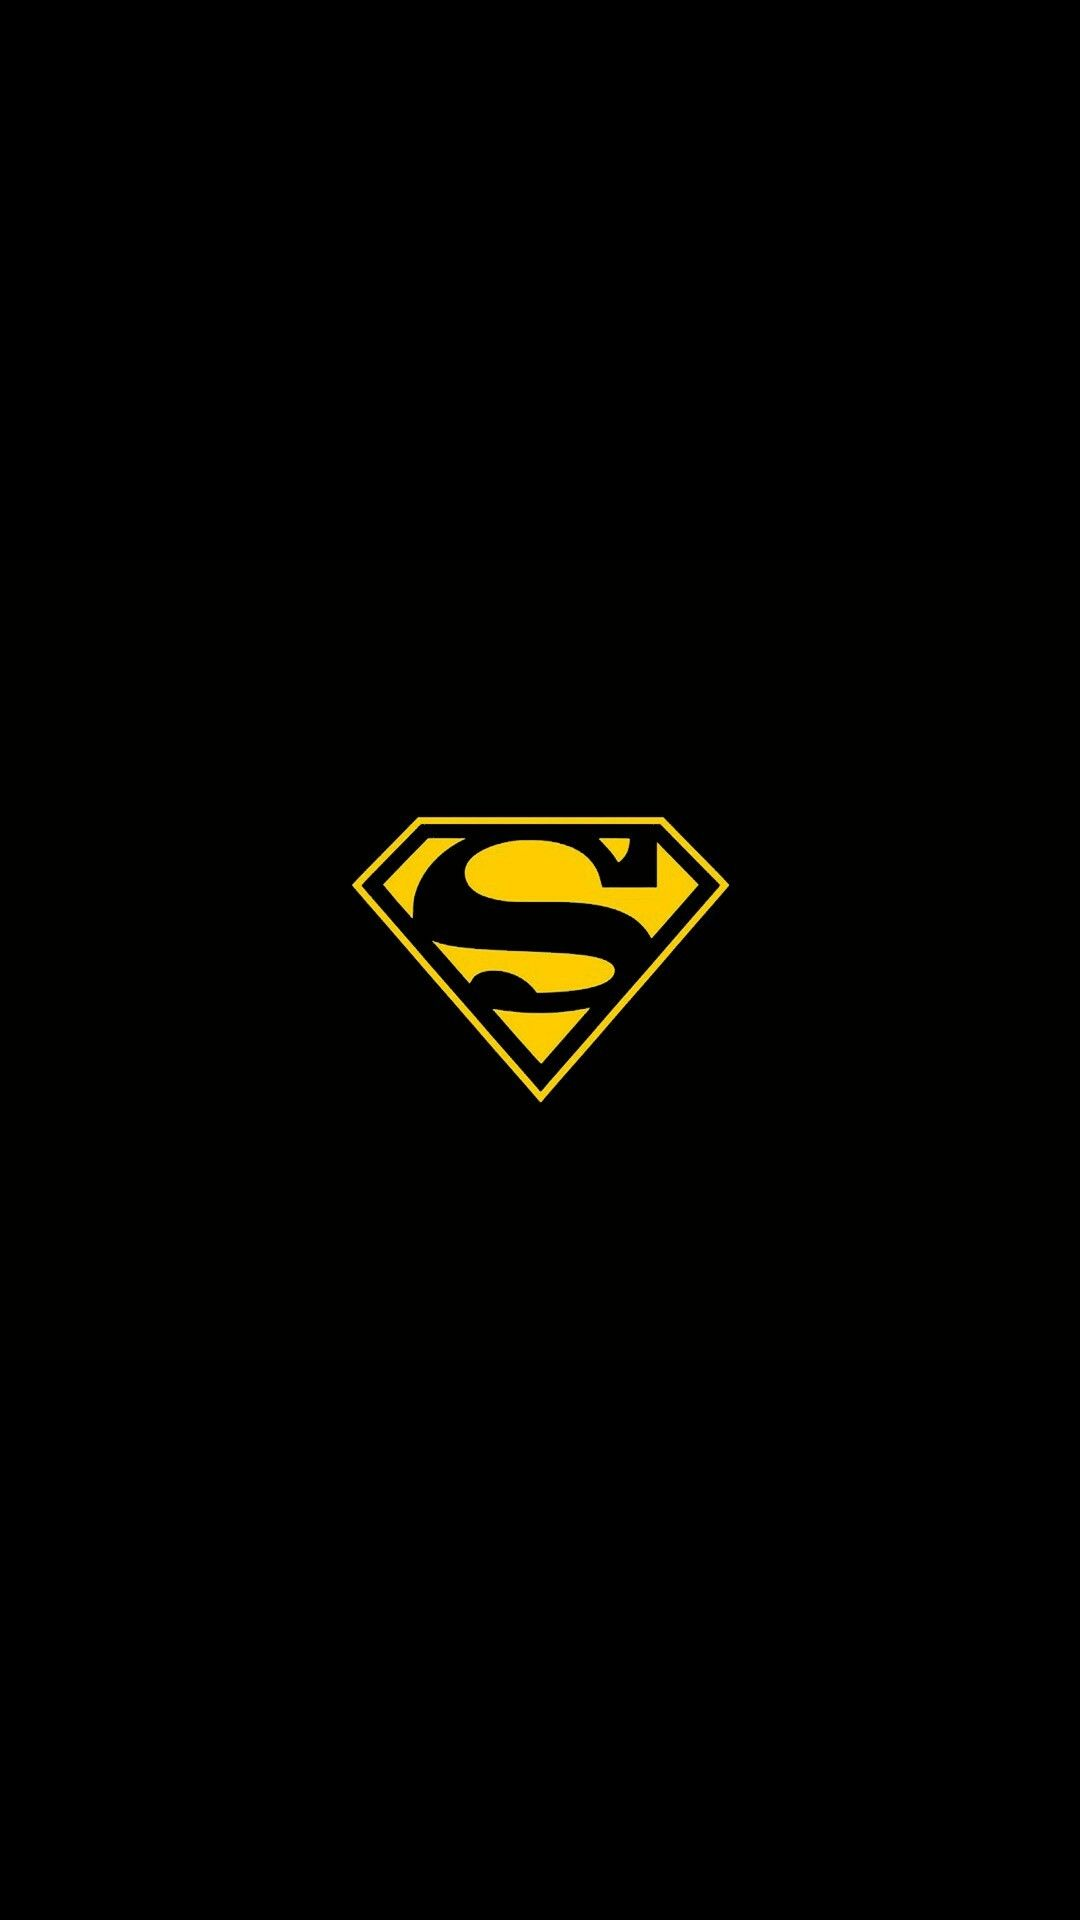 Visit Minimalist Superhero Android Background On High Definition Wallpaper At Rainbowwallpaper Info P In 2020 Superman Wallpaper Superman Logo Superman Wallpaper Logo